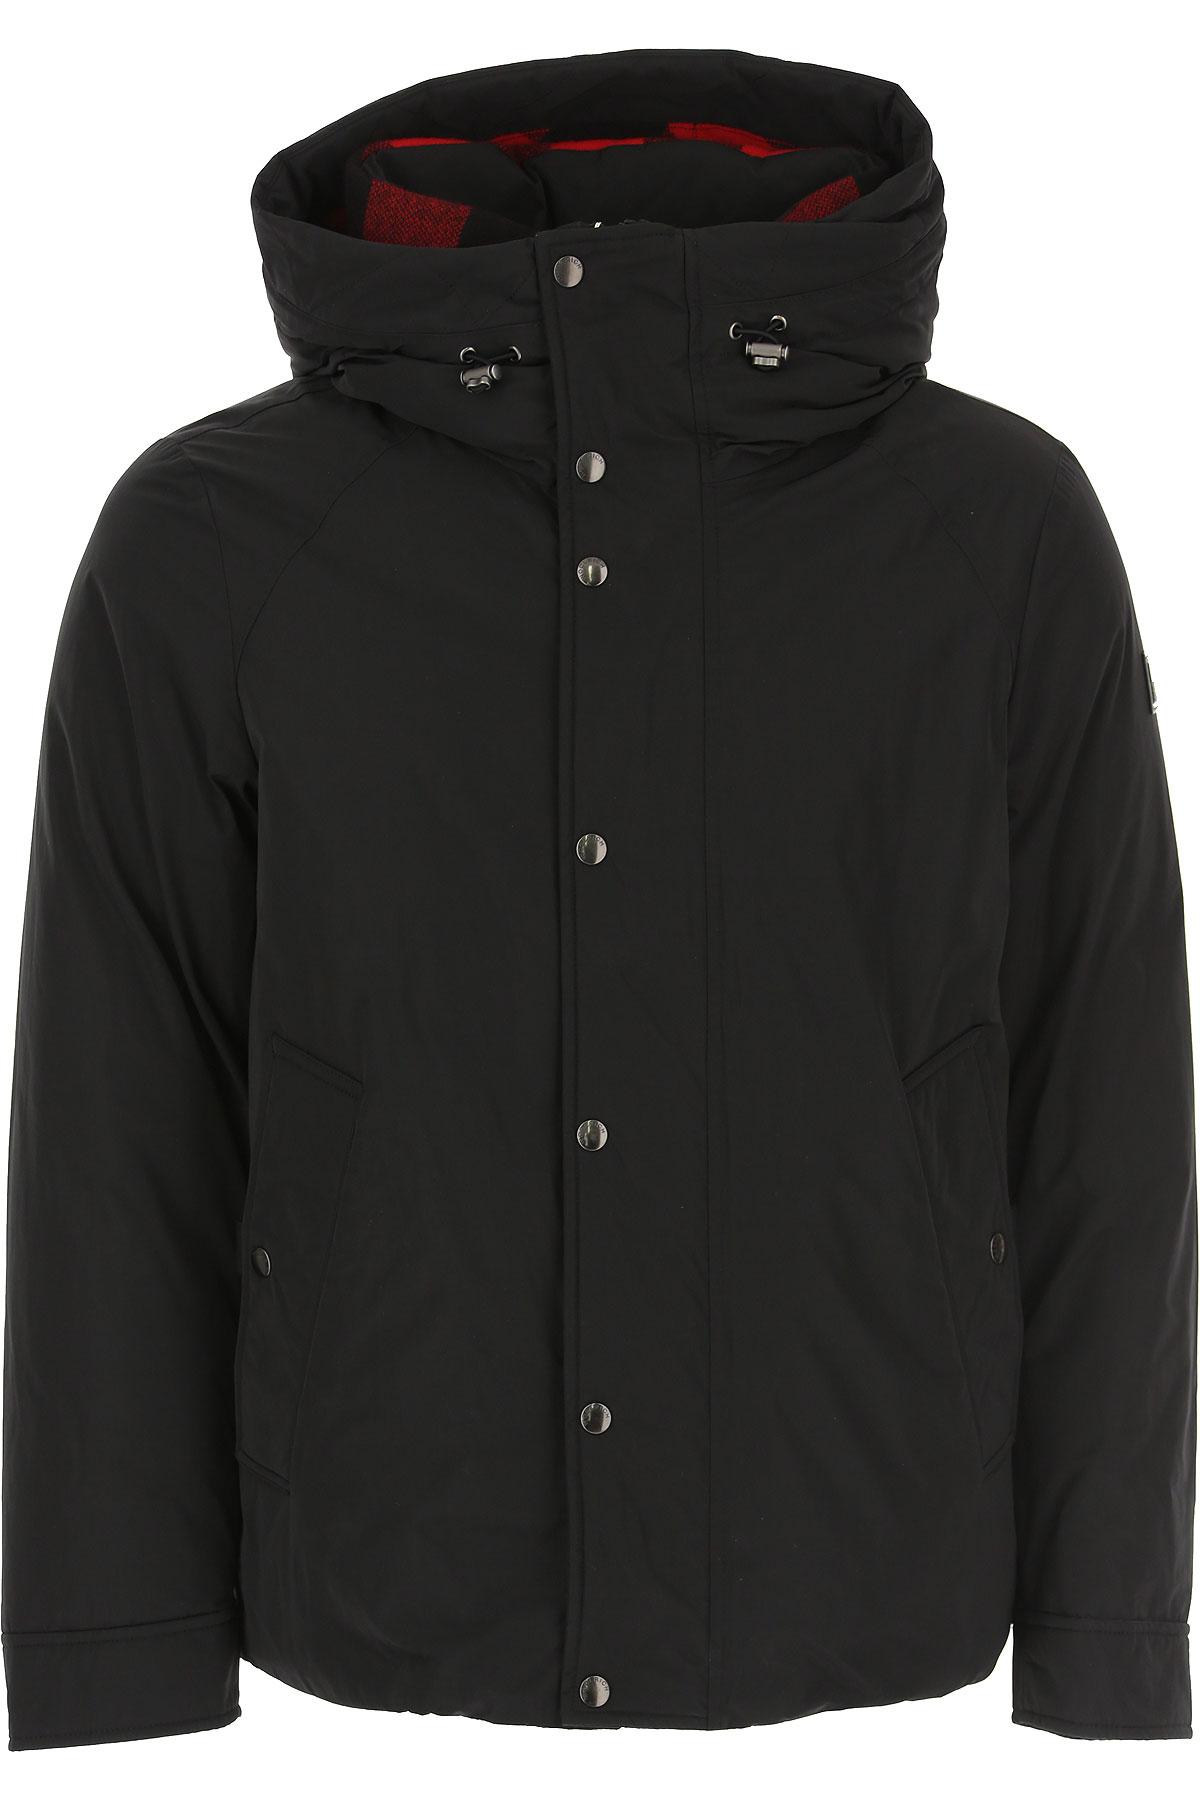 Woolrich Down Jacket for Men, Puffer Ski Jacket On Sale, Black, polyamide, 2019, L S